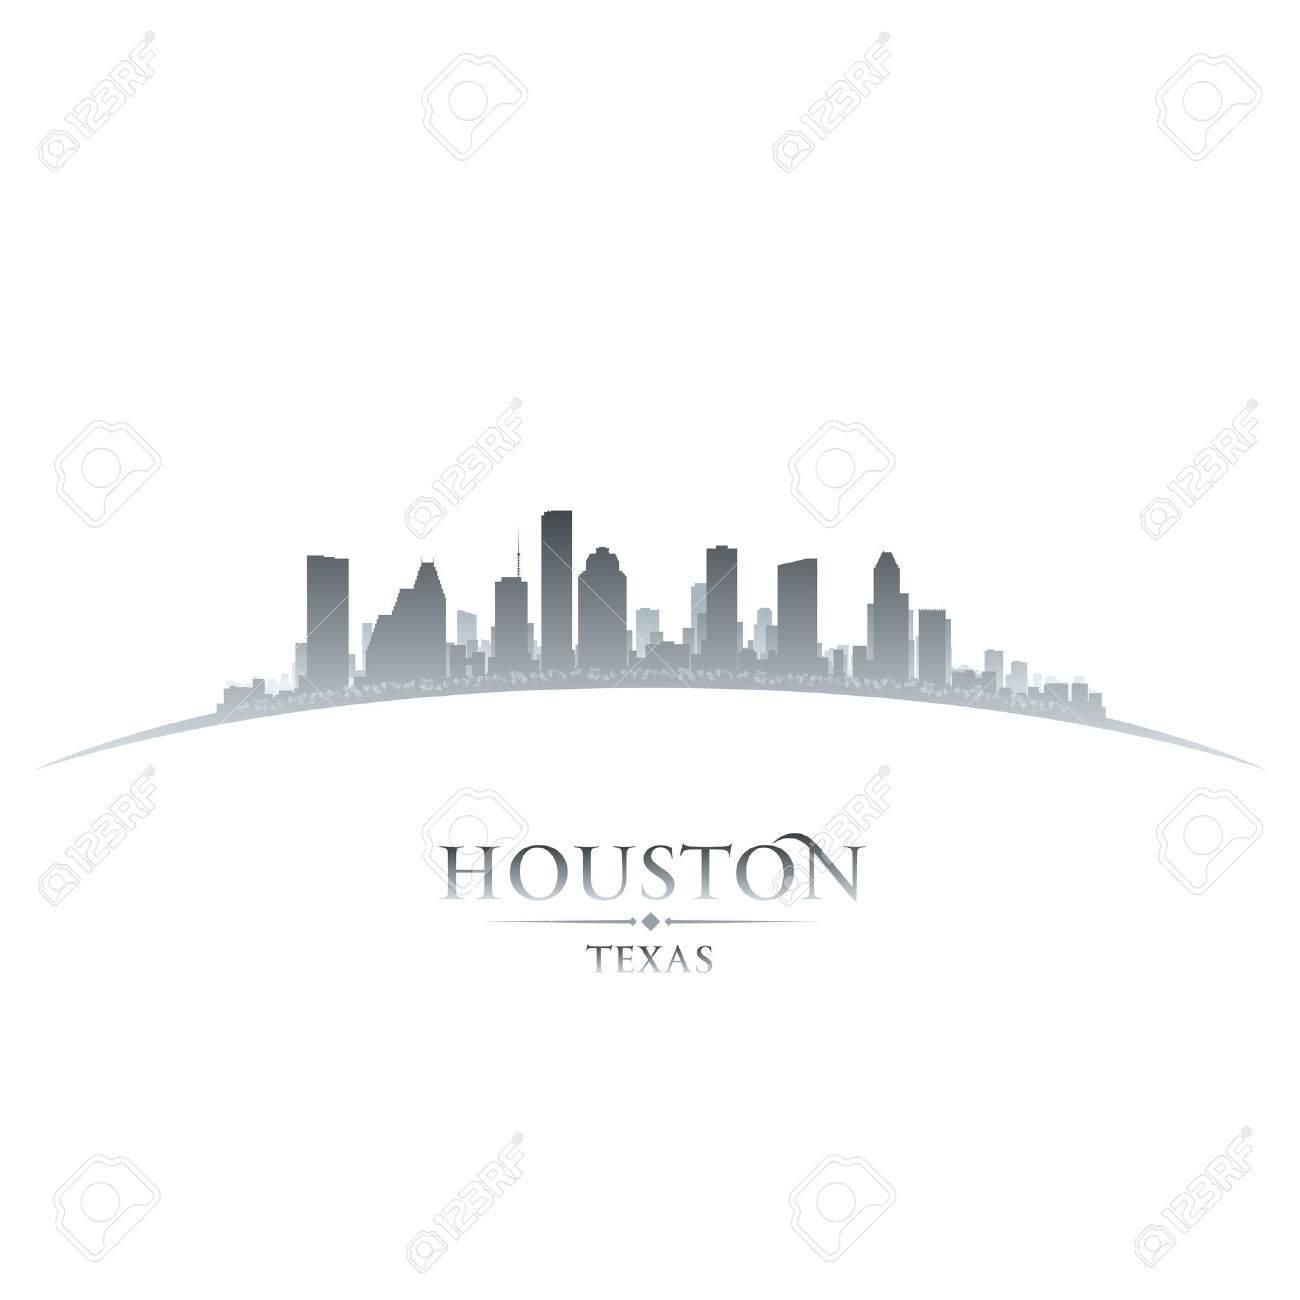 Houston Texas city skyline silhouette. Vector illustration Stock Vector - 24601186